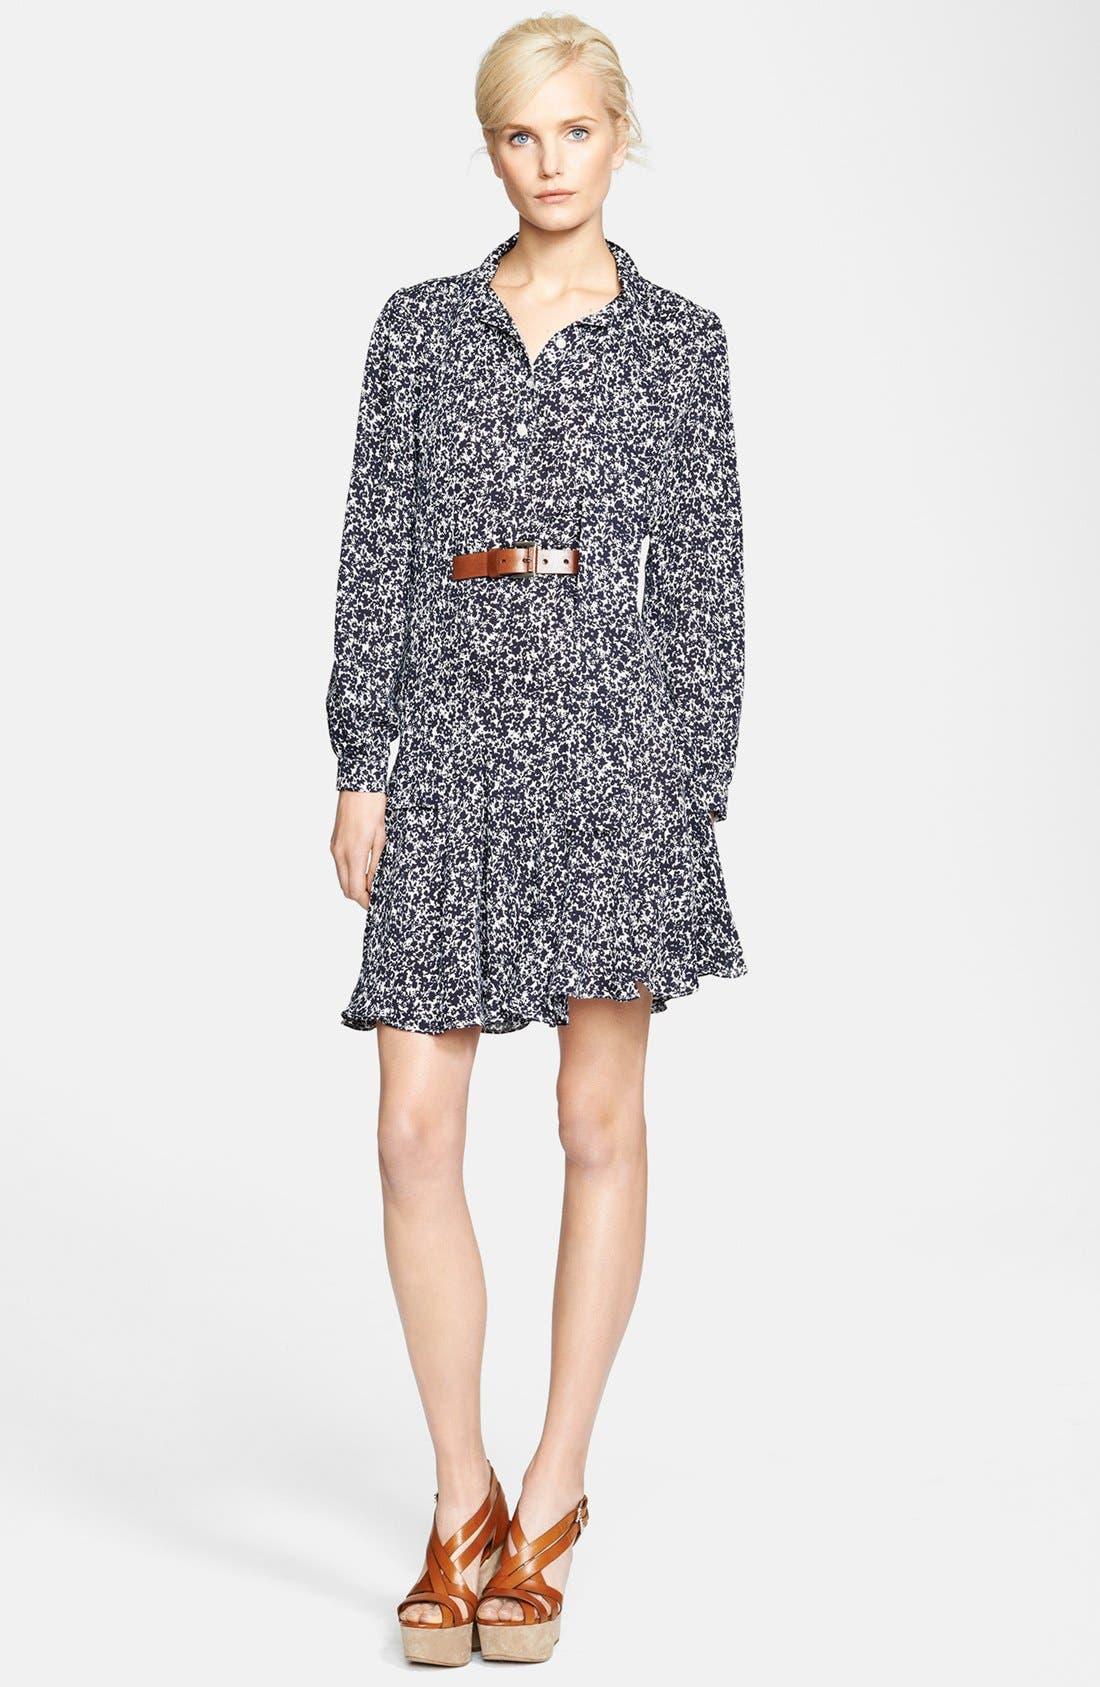 Alternate Image 1 Selected - Michael Kors Print Silk Georgette Dress